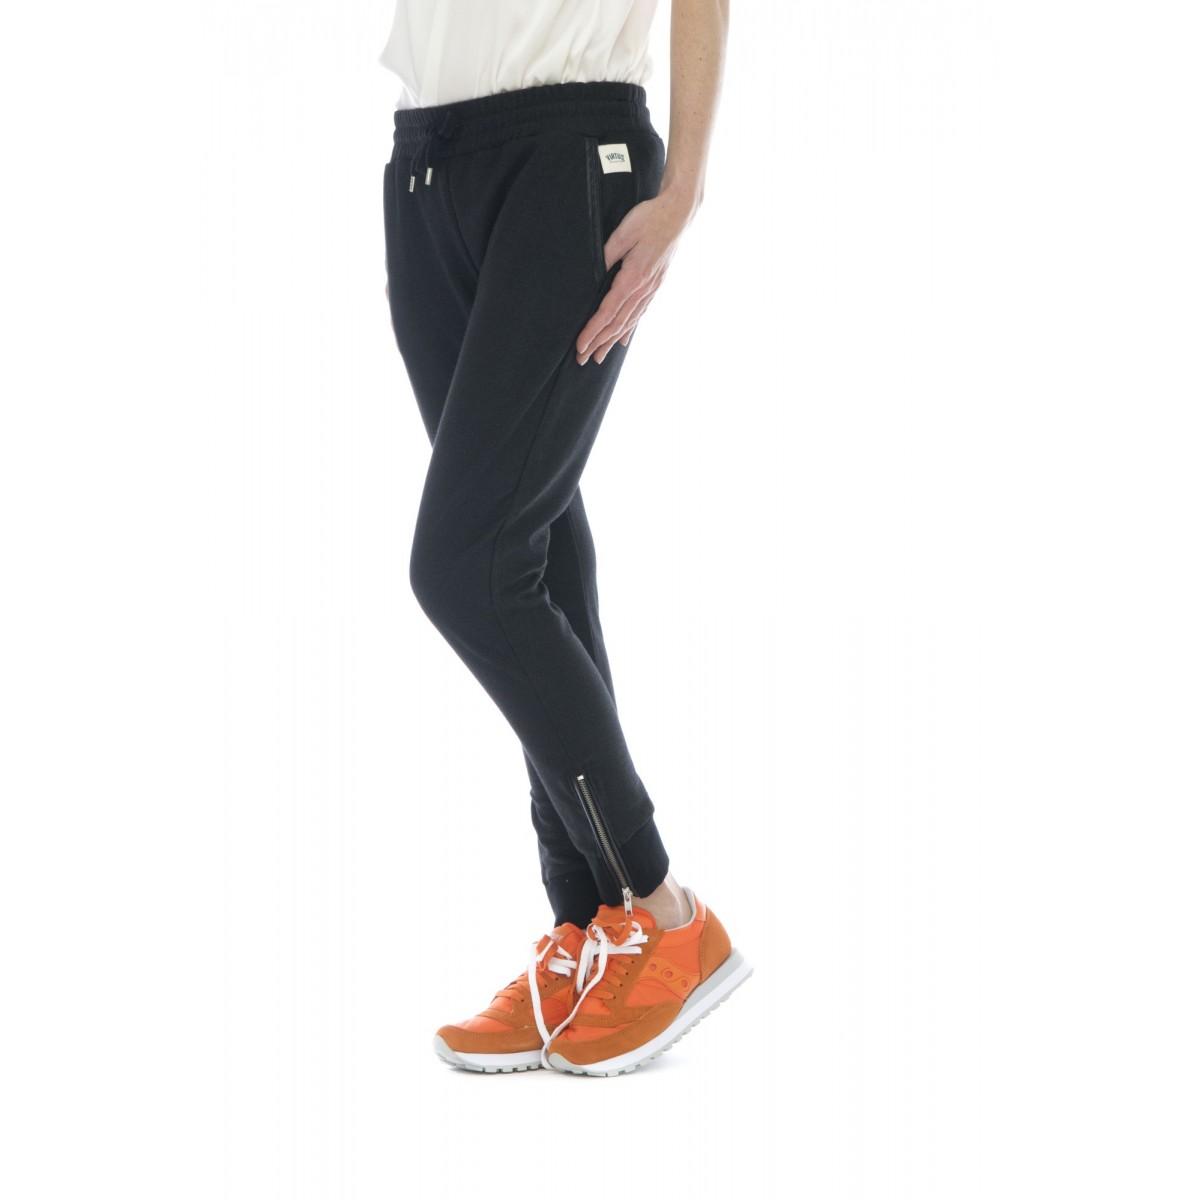 Pantalone donna - 523 fv23 pantalone spalmato